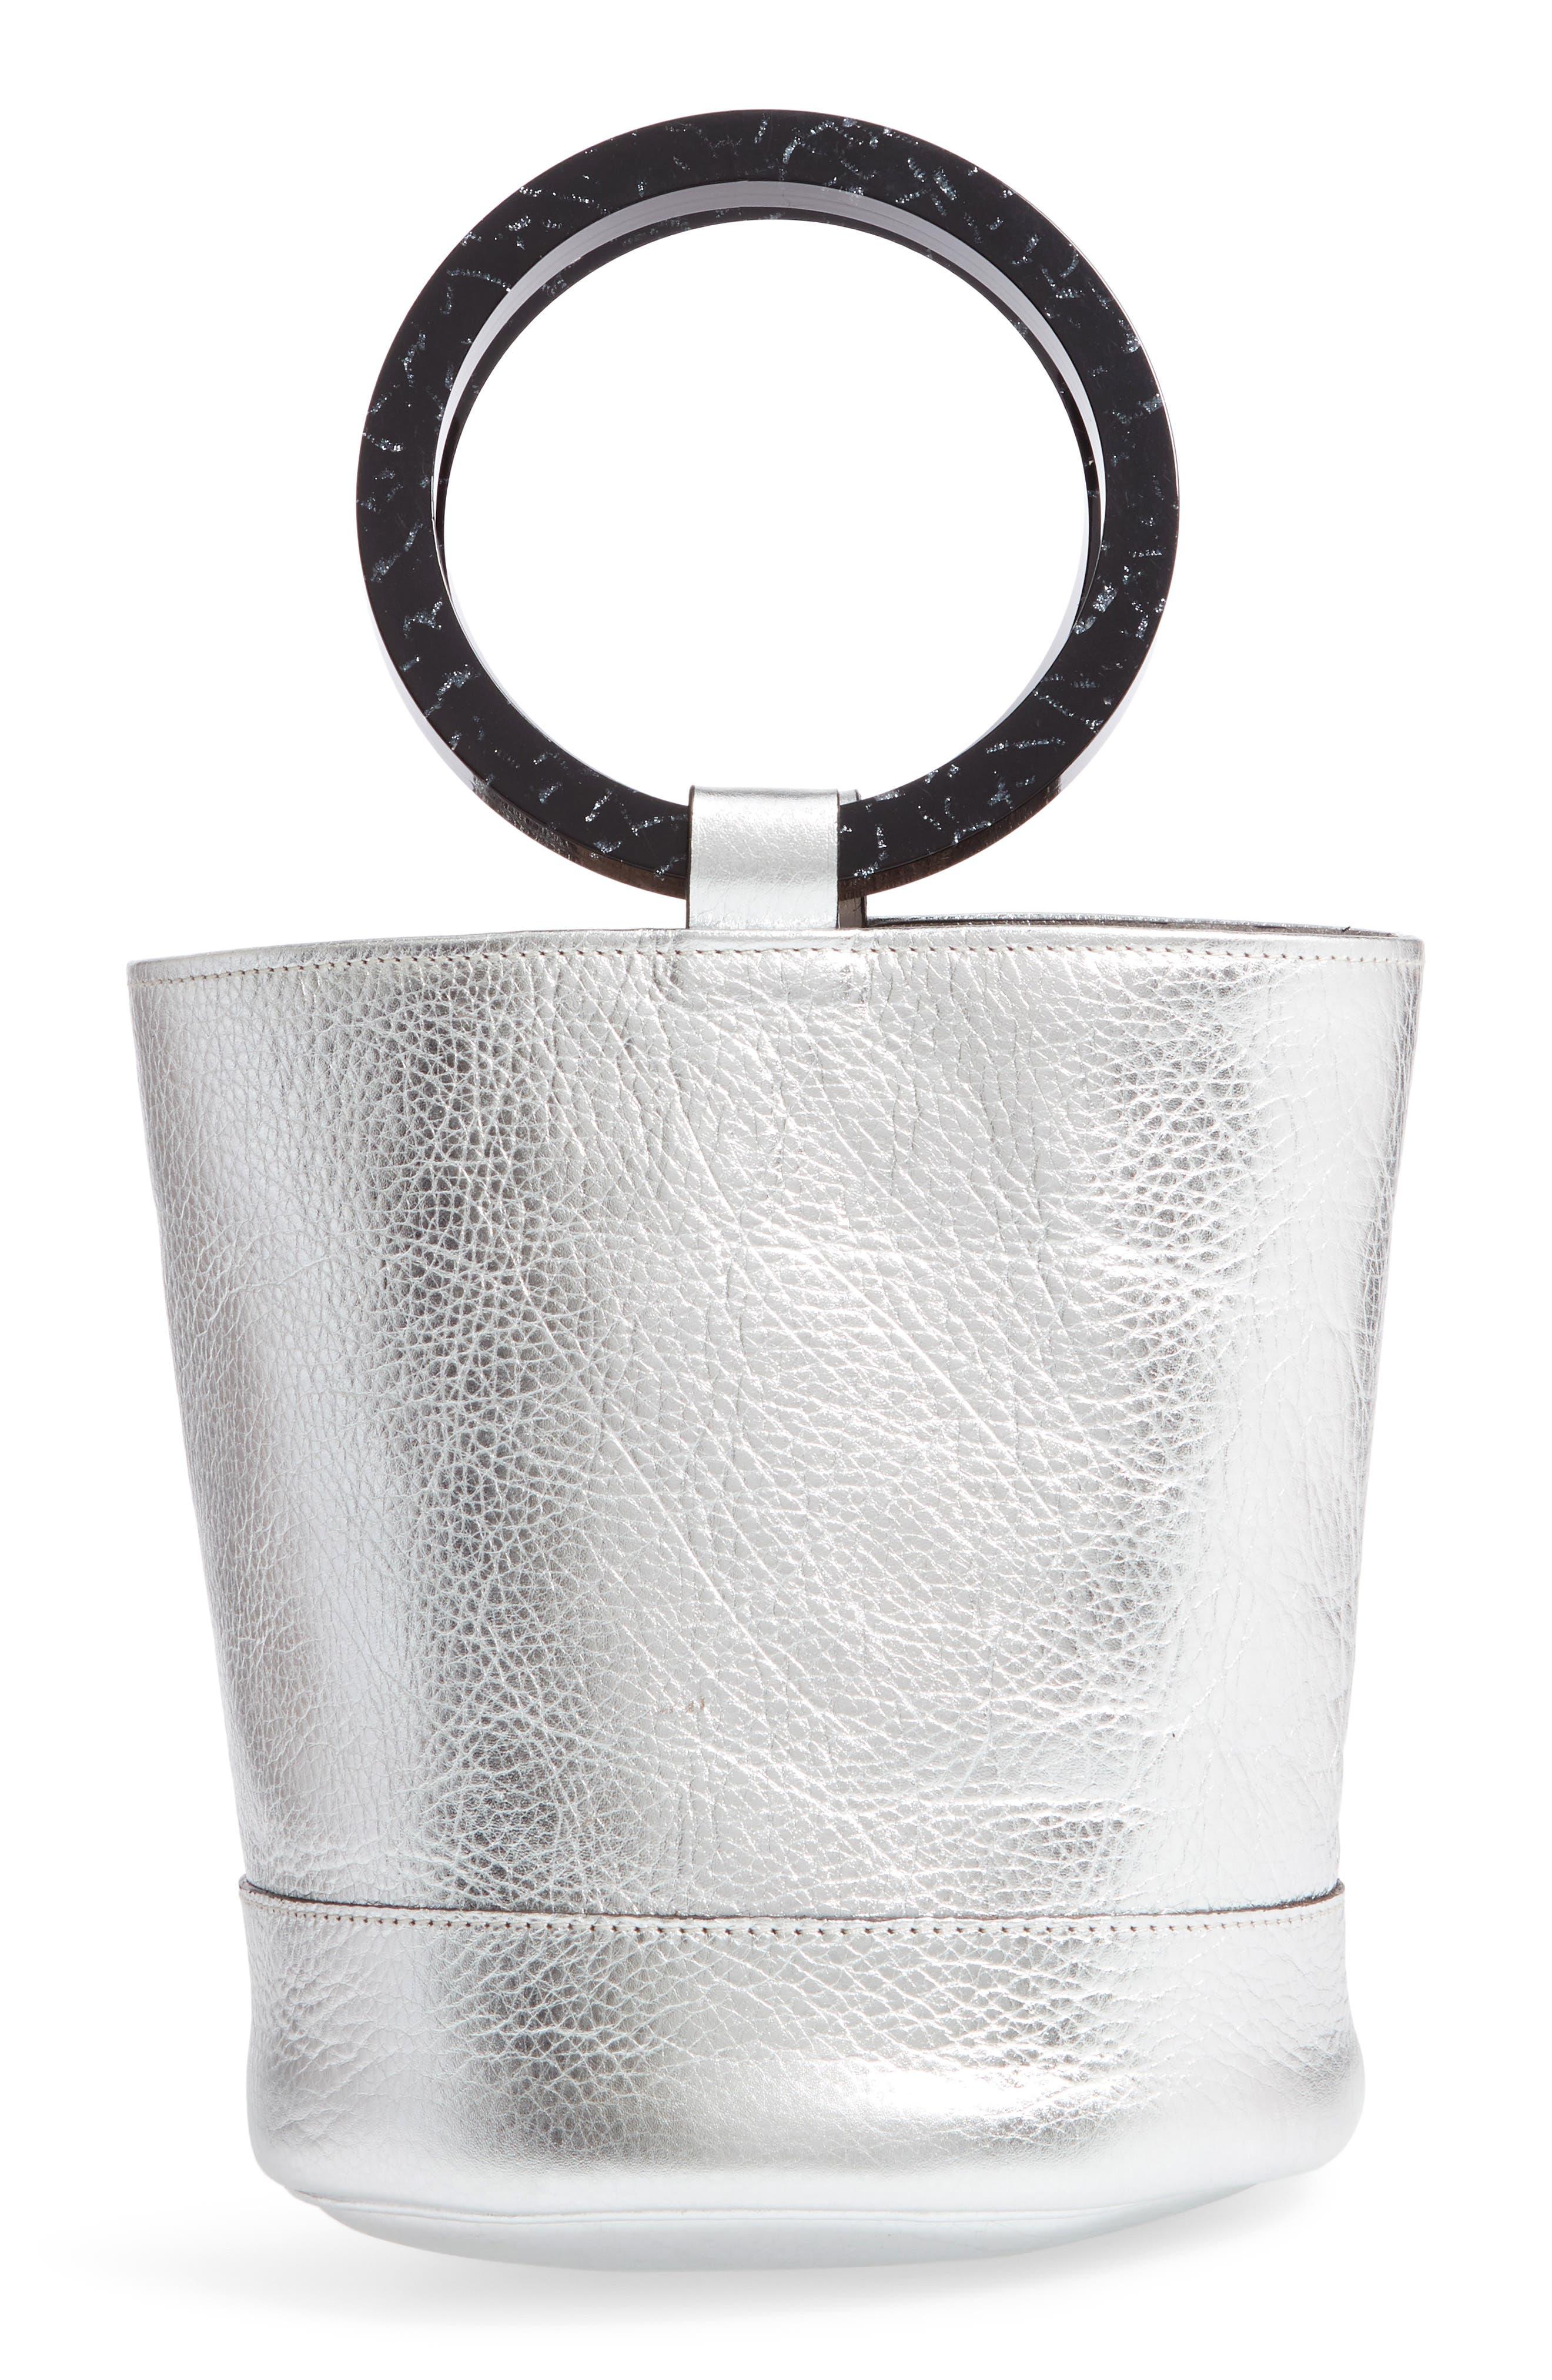 Bonsai 20 Pebbled Leather Bucket Bag,                             Main thumbnail 1, color,                             Silver